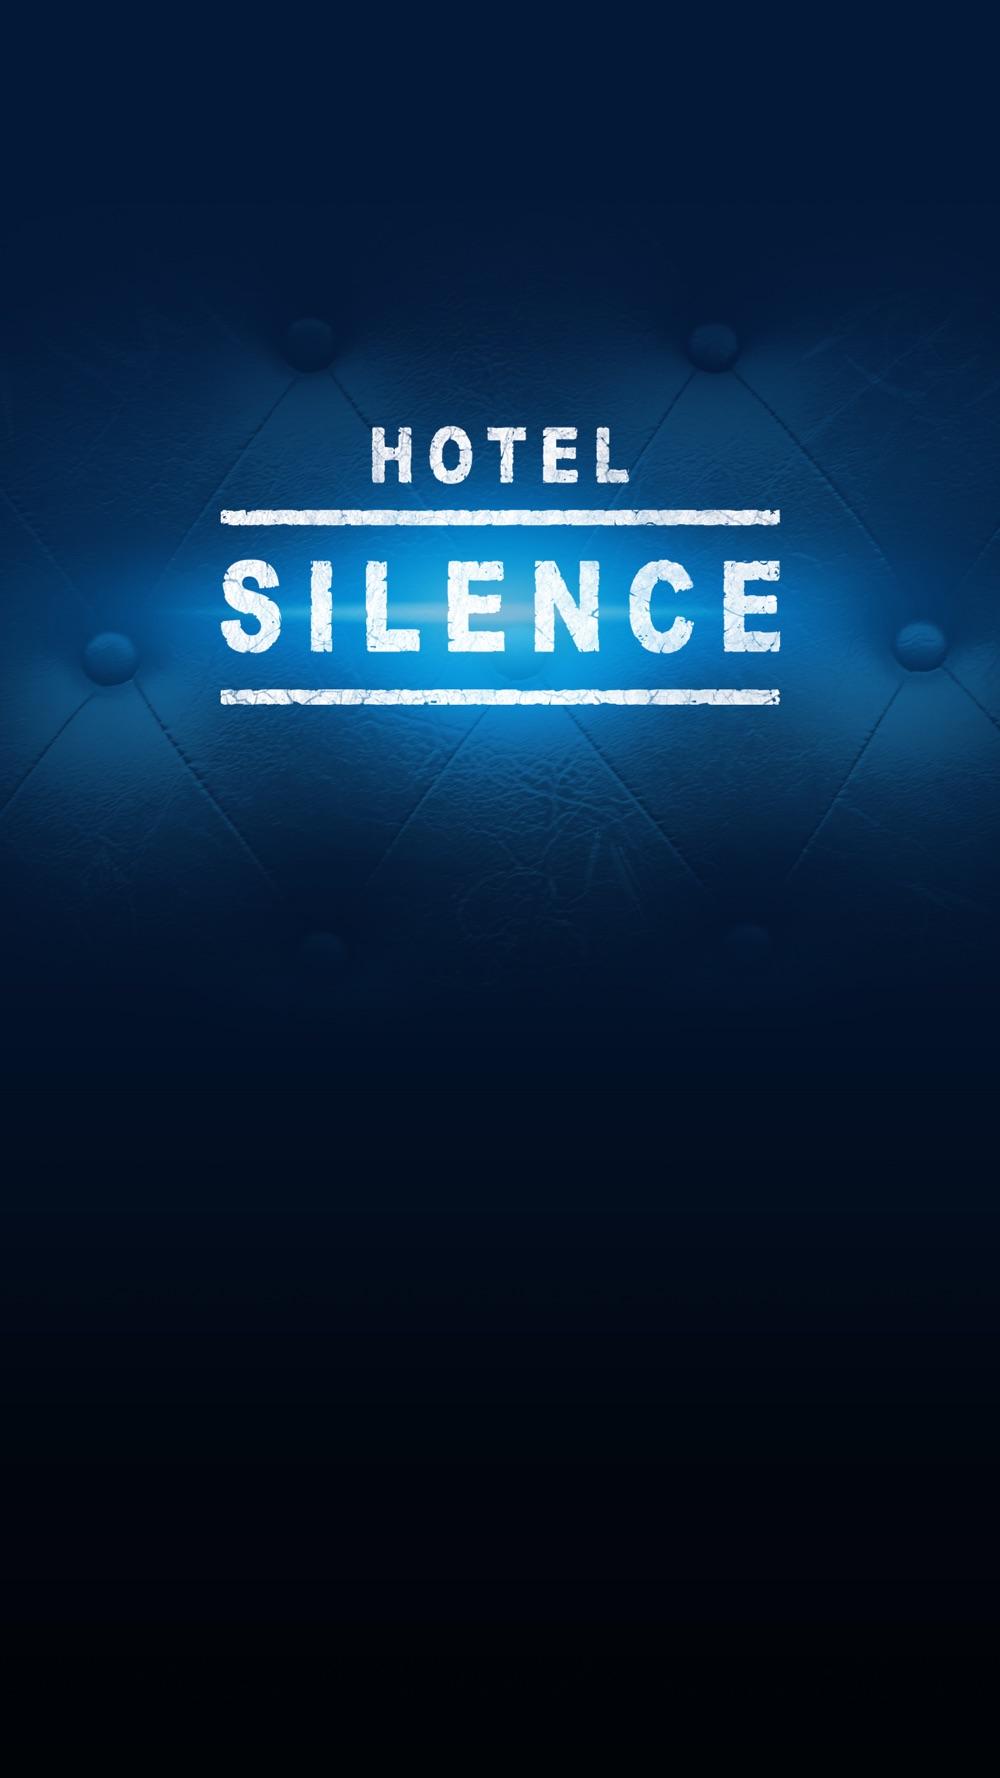 Hotel Silence Cheat Codes